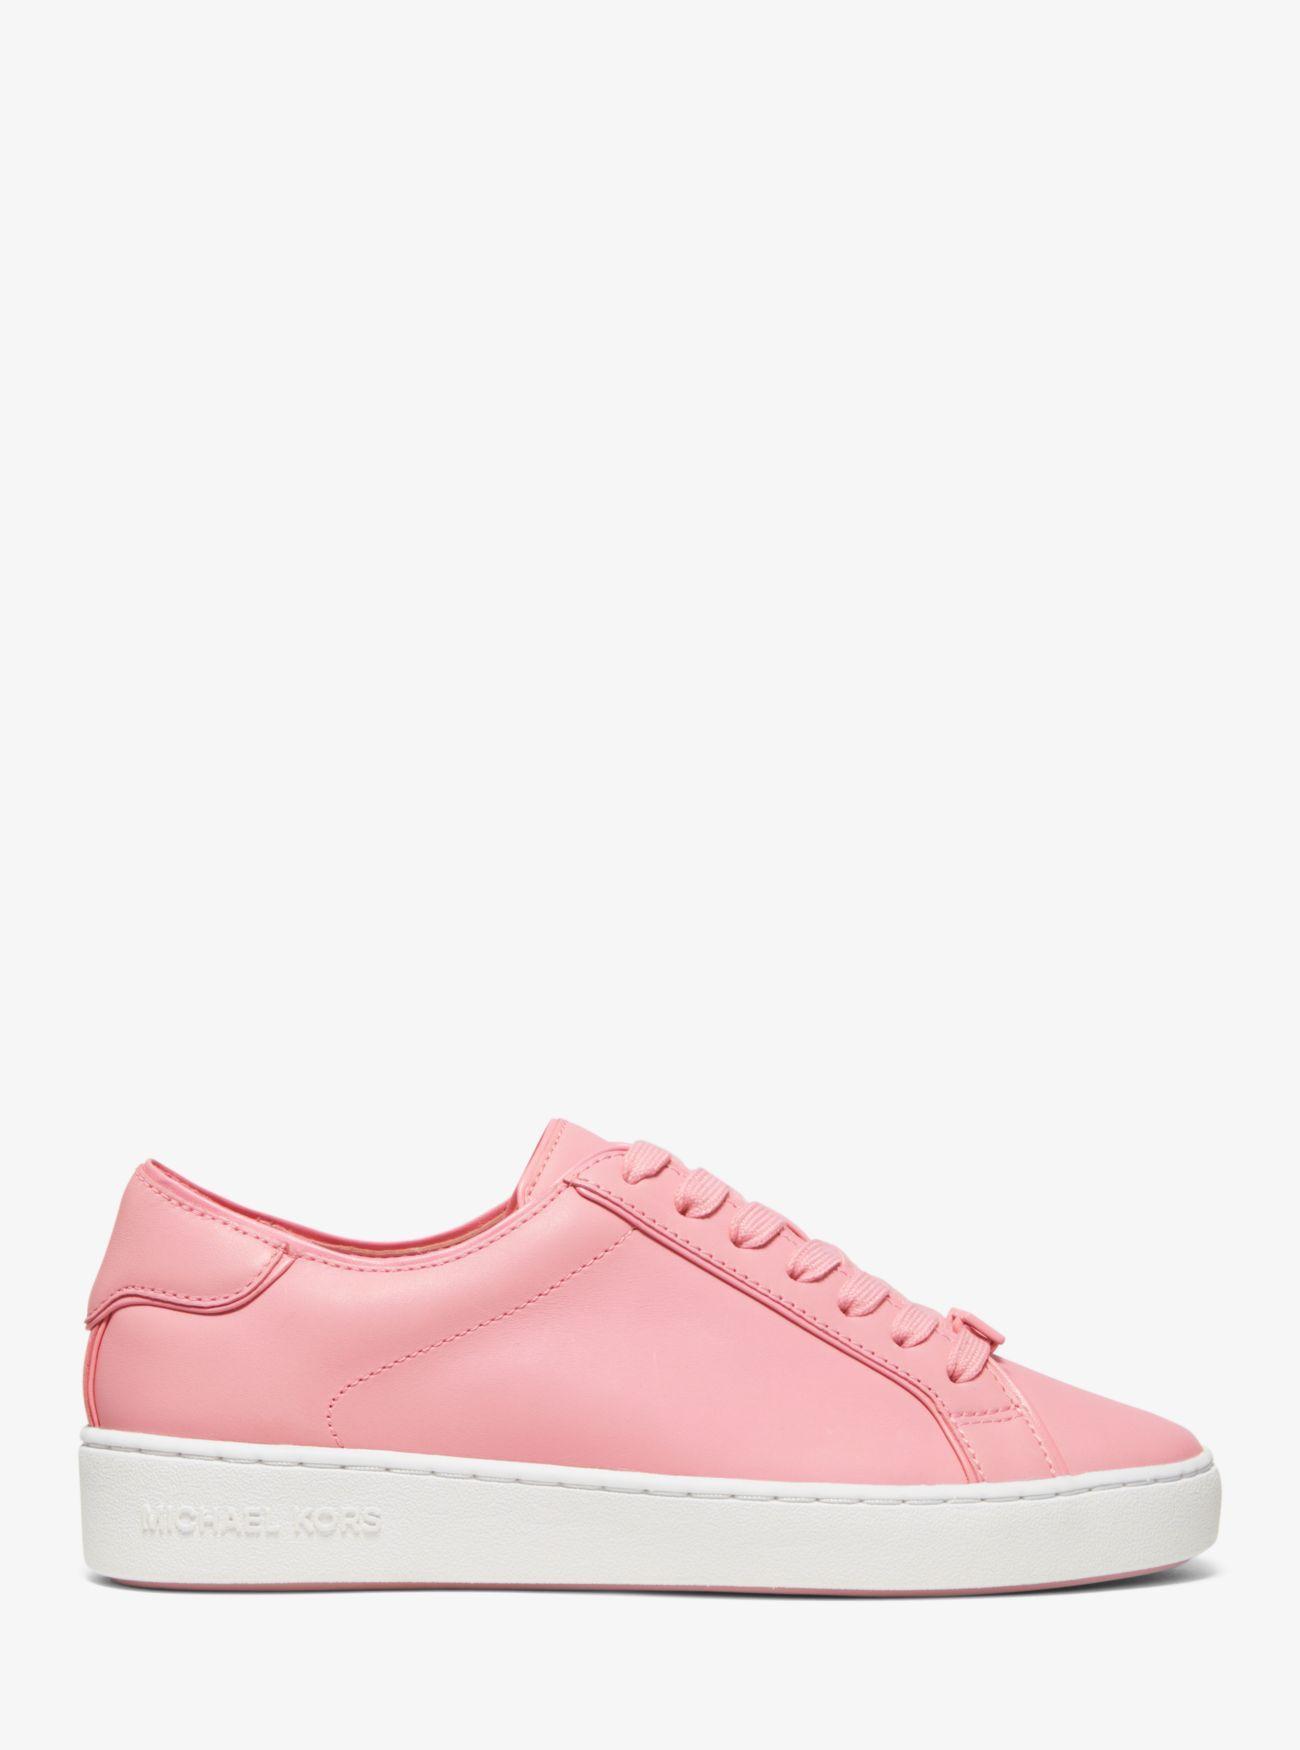 Michael Kors Harper Leather Sneaker in